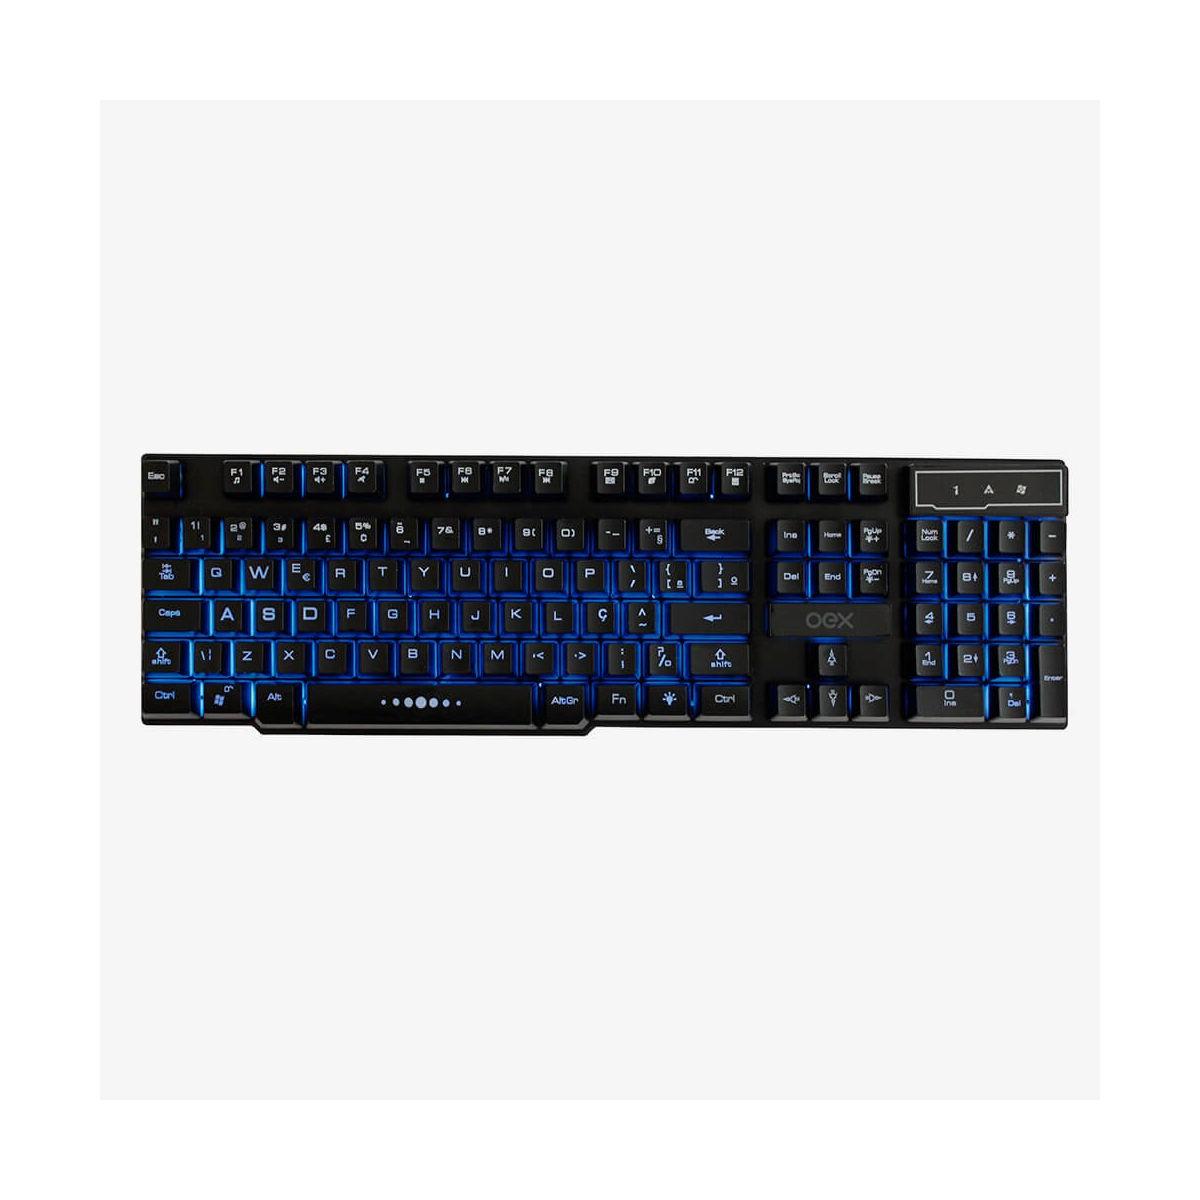 Teclado Oex Game Force-x Com LED Blacklight 3 Cores TC 201